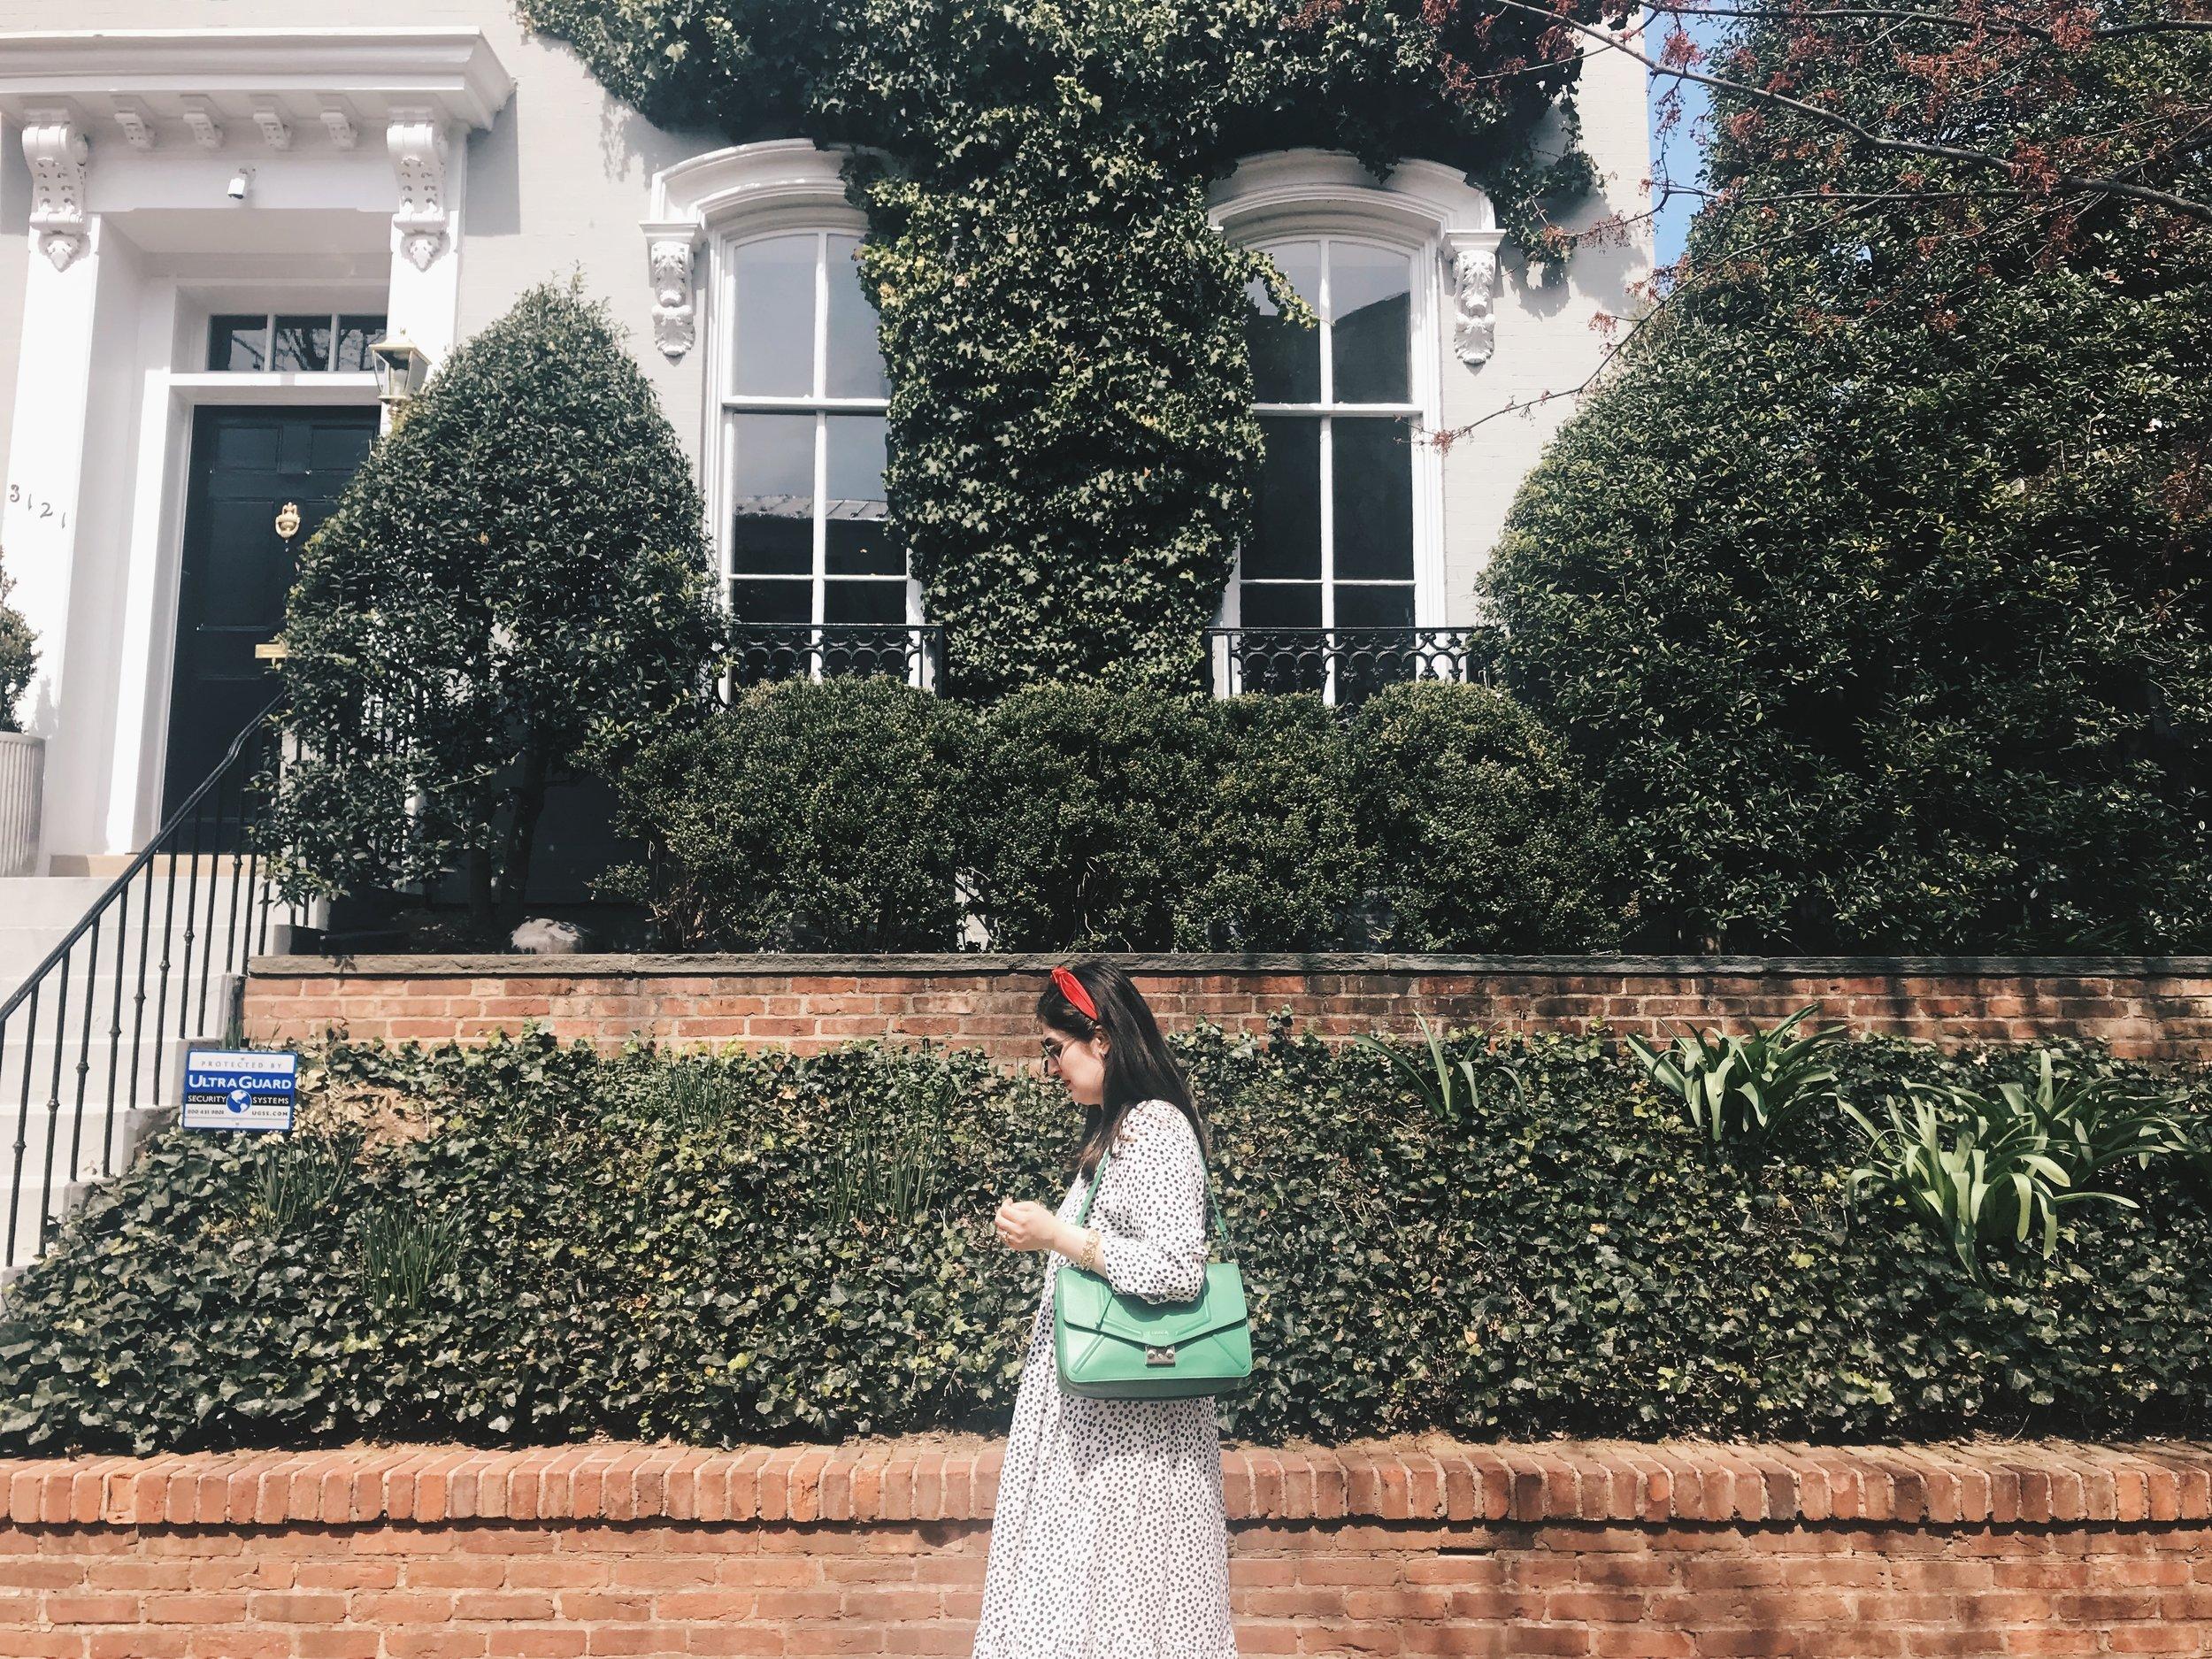 The Attic on Eighth Spring Fashion Olivia Gündüz-Willemin polka dot dress Georgetown 1.JPG